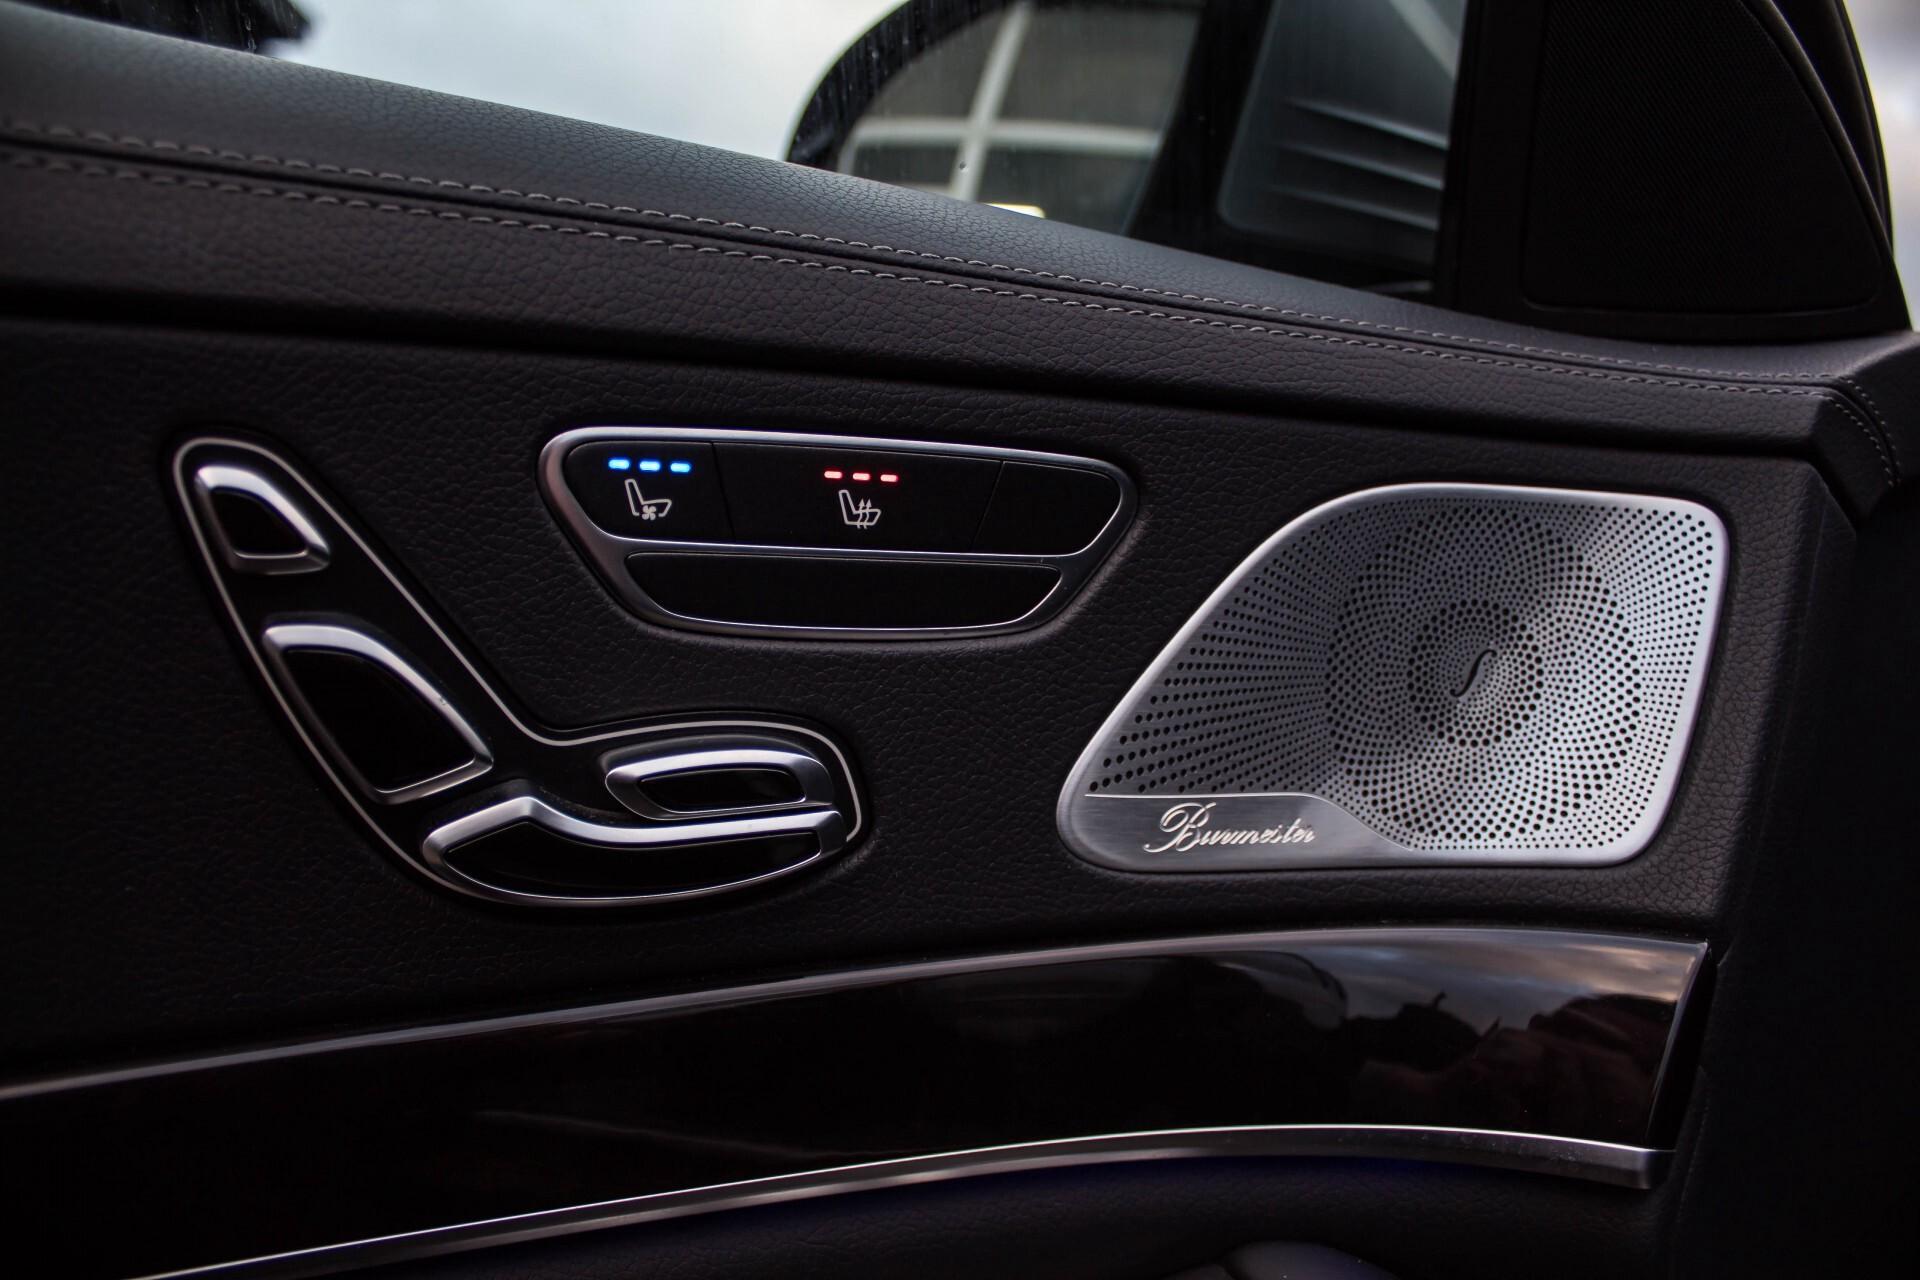 Mercedes-Benz S-Klasse 350 BlueTEC 63 AMG Panorama/Distronic/Keyless/Massage/Burmester Aut7 Foto 29